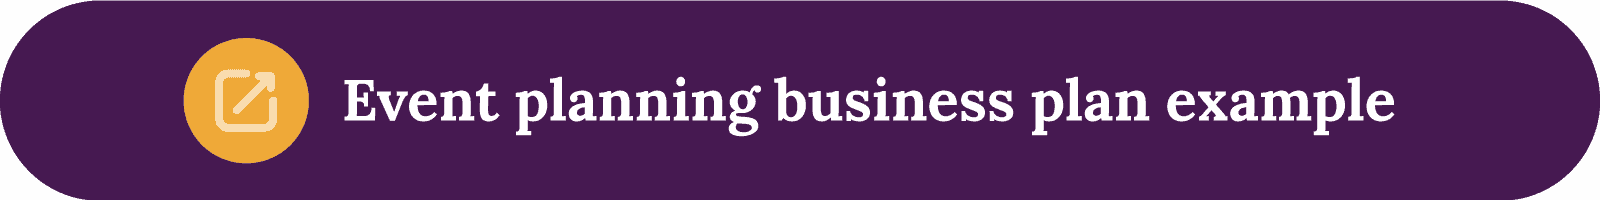 Event planning business plan template button